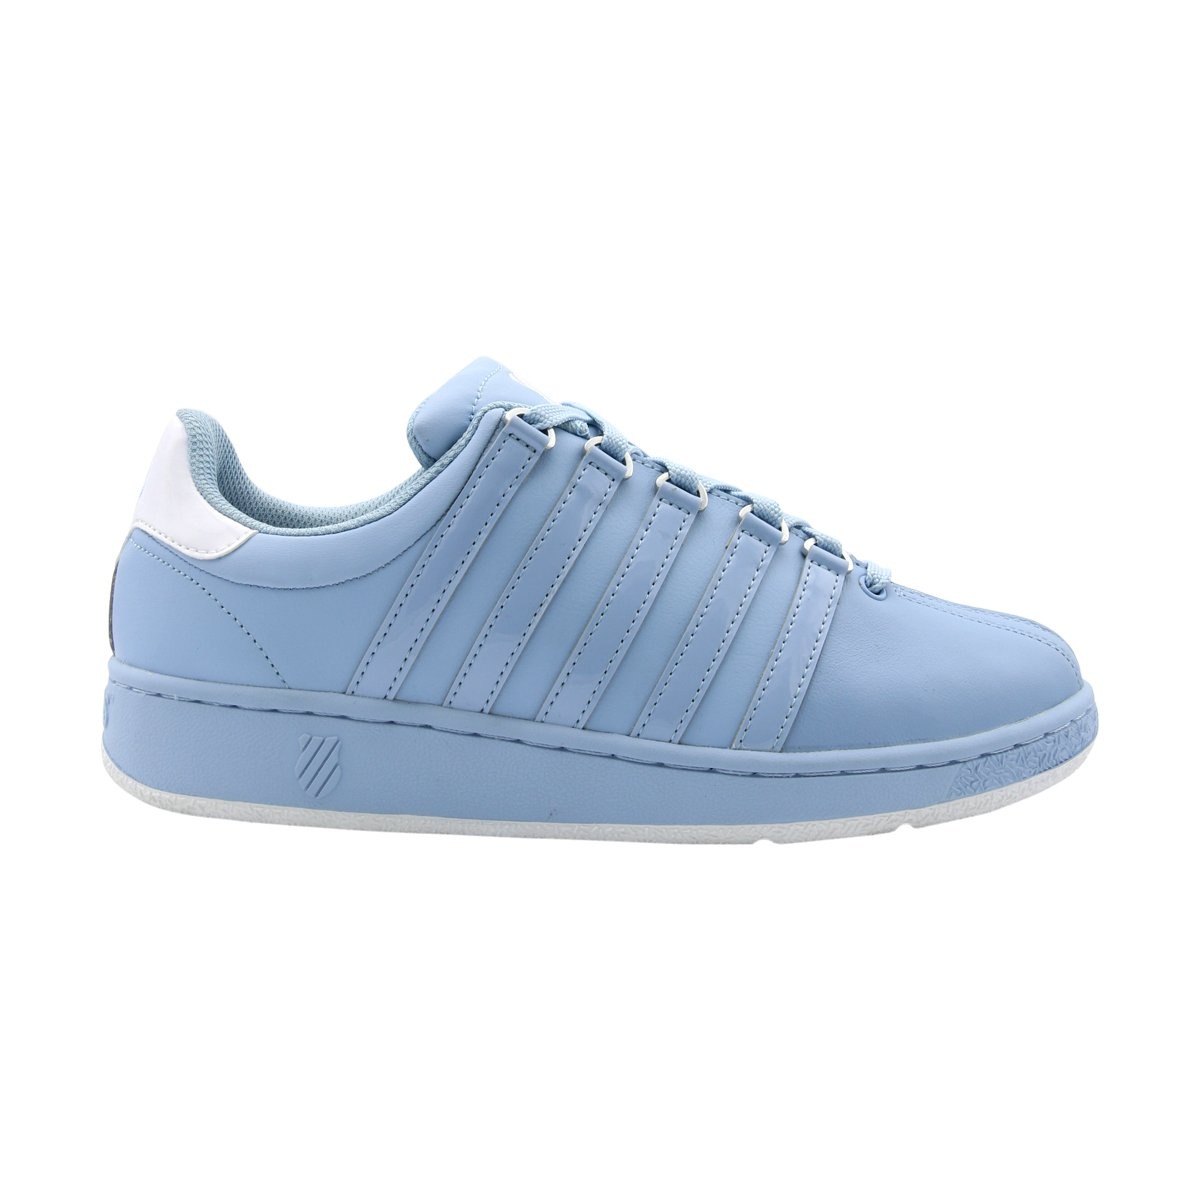 K-Swiss Women's Classic Vn Sneaker B01LXZRISV 9 B(M) US|Dream Blue/White